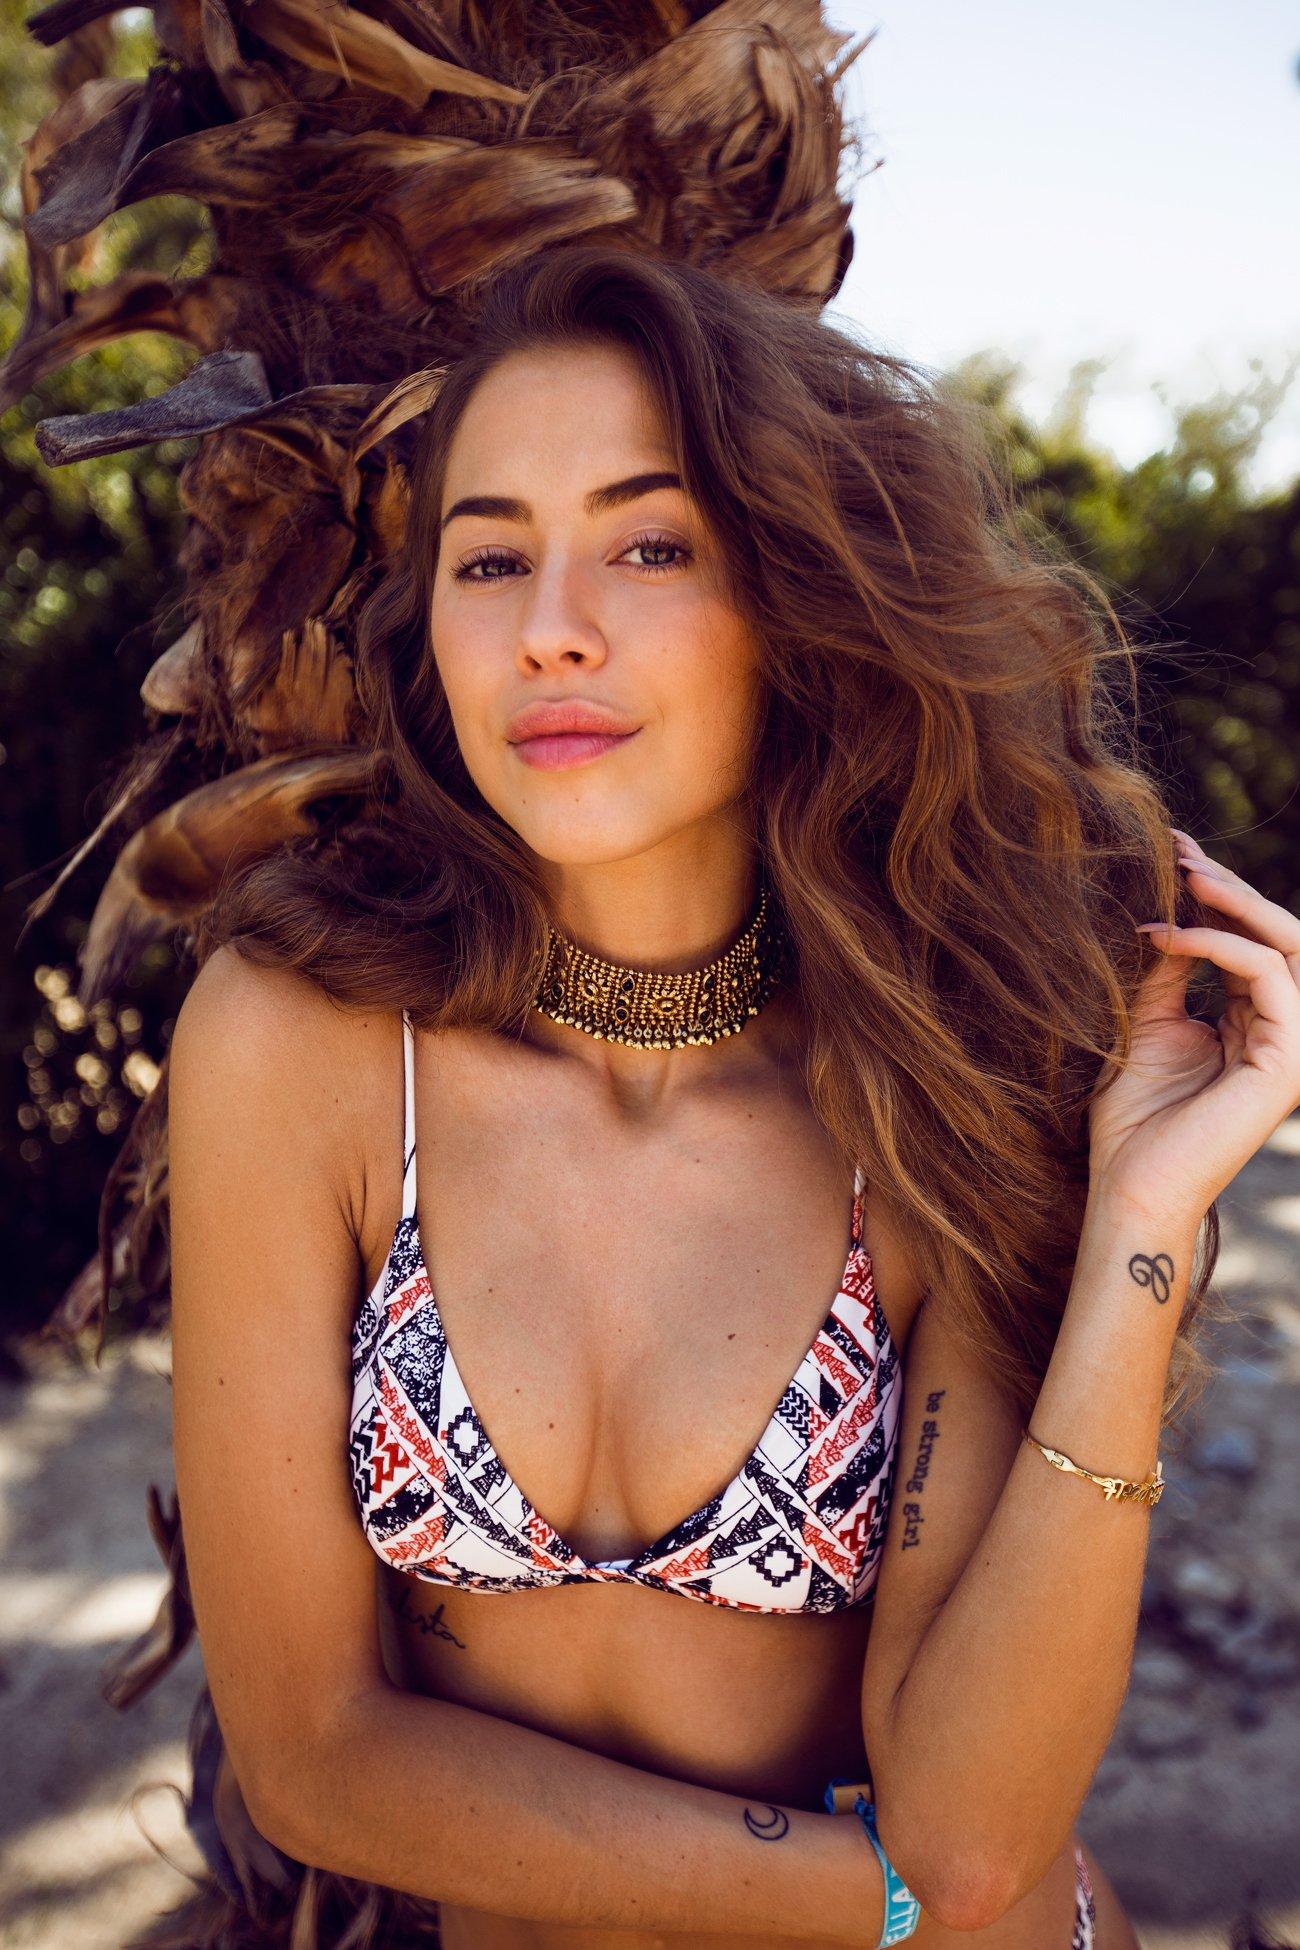 Kenza_Zouiten_Revovle_Bikini_01